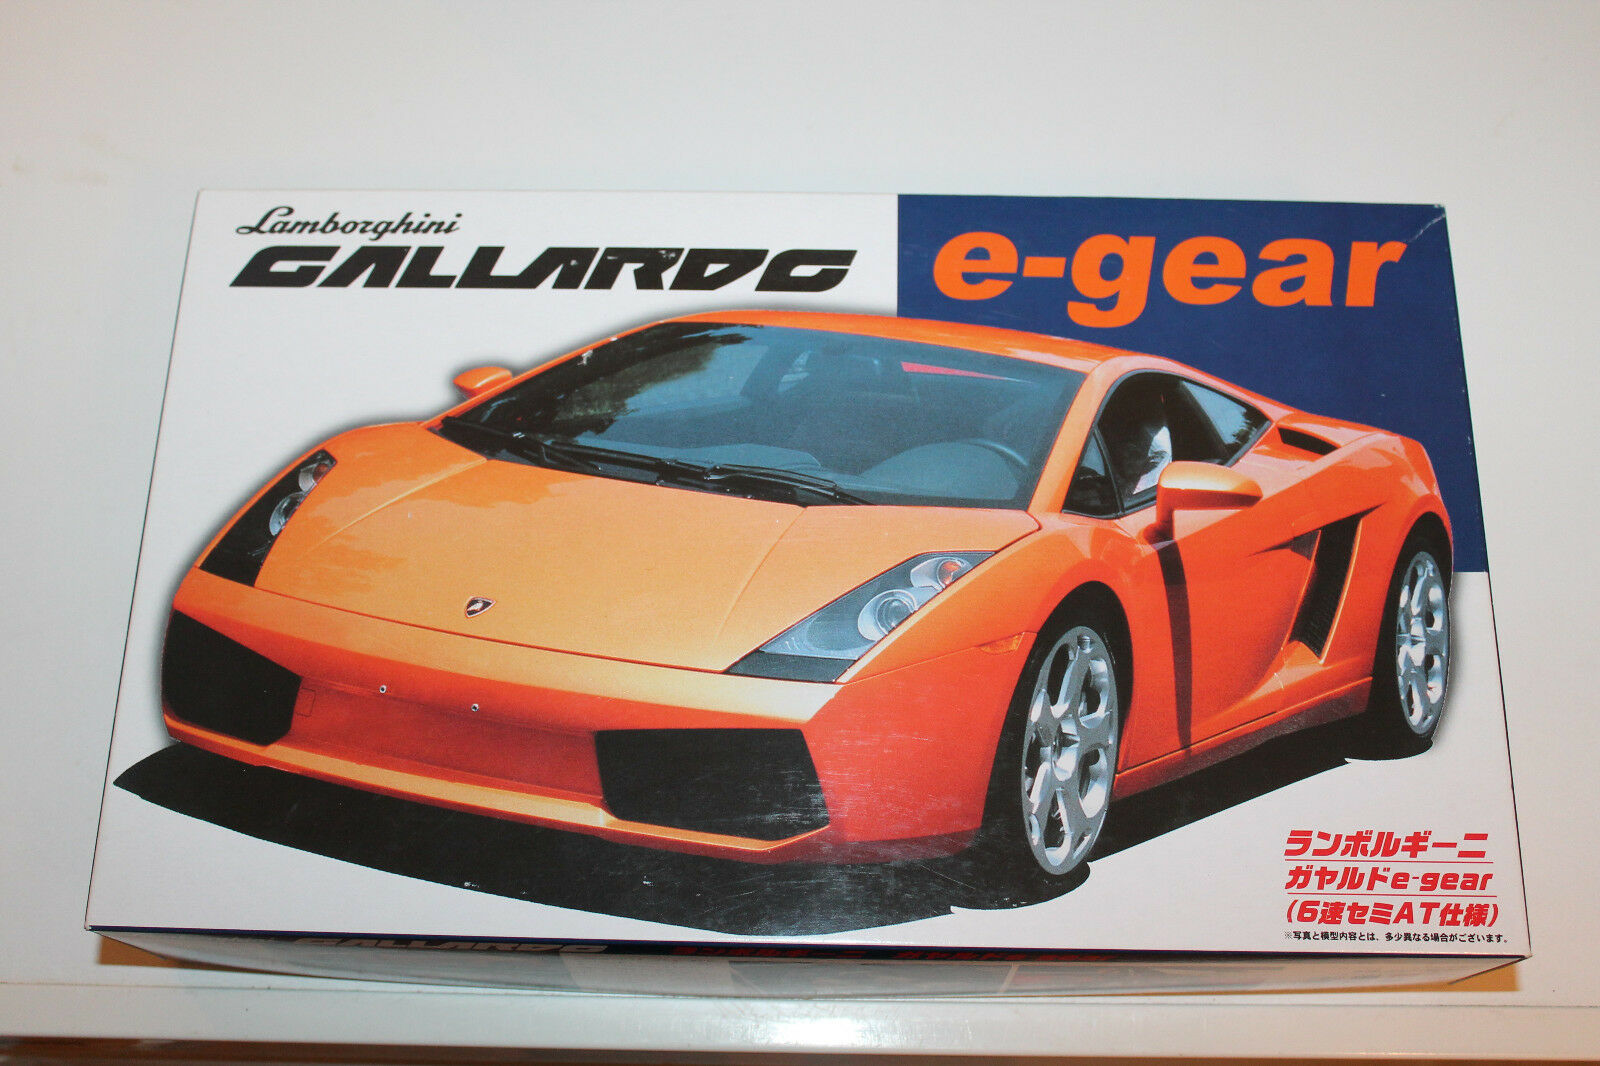 Fujimi Fujimi Fujimi 12215 Lamborghini Gallardo e-gear 1 24 NEU OVP RAR  | Große Auswahl  cc512b